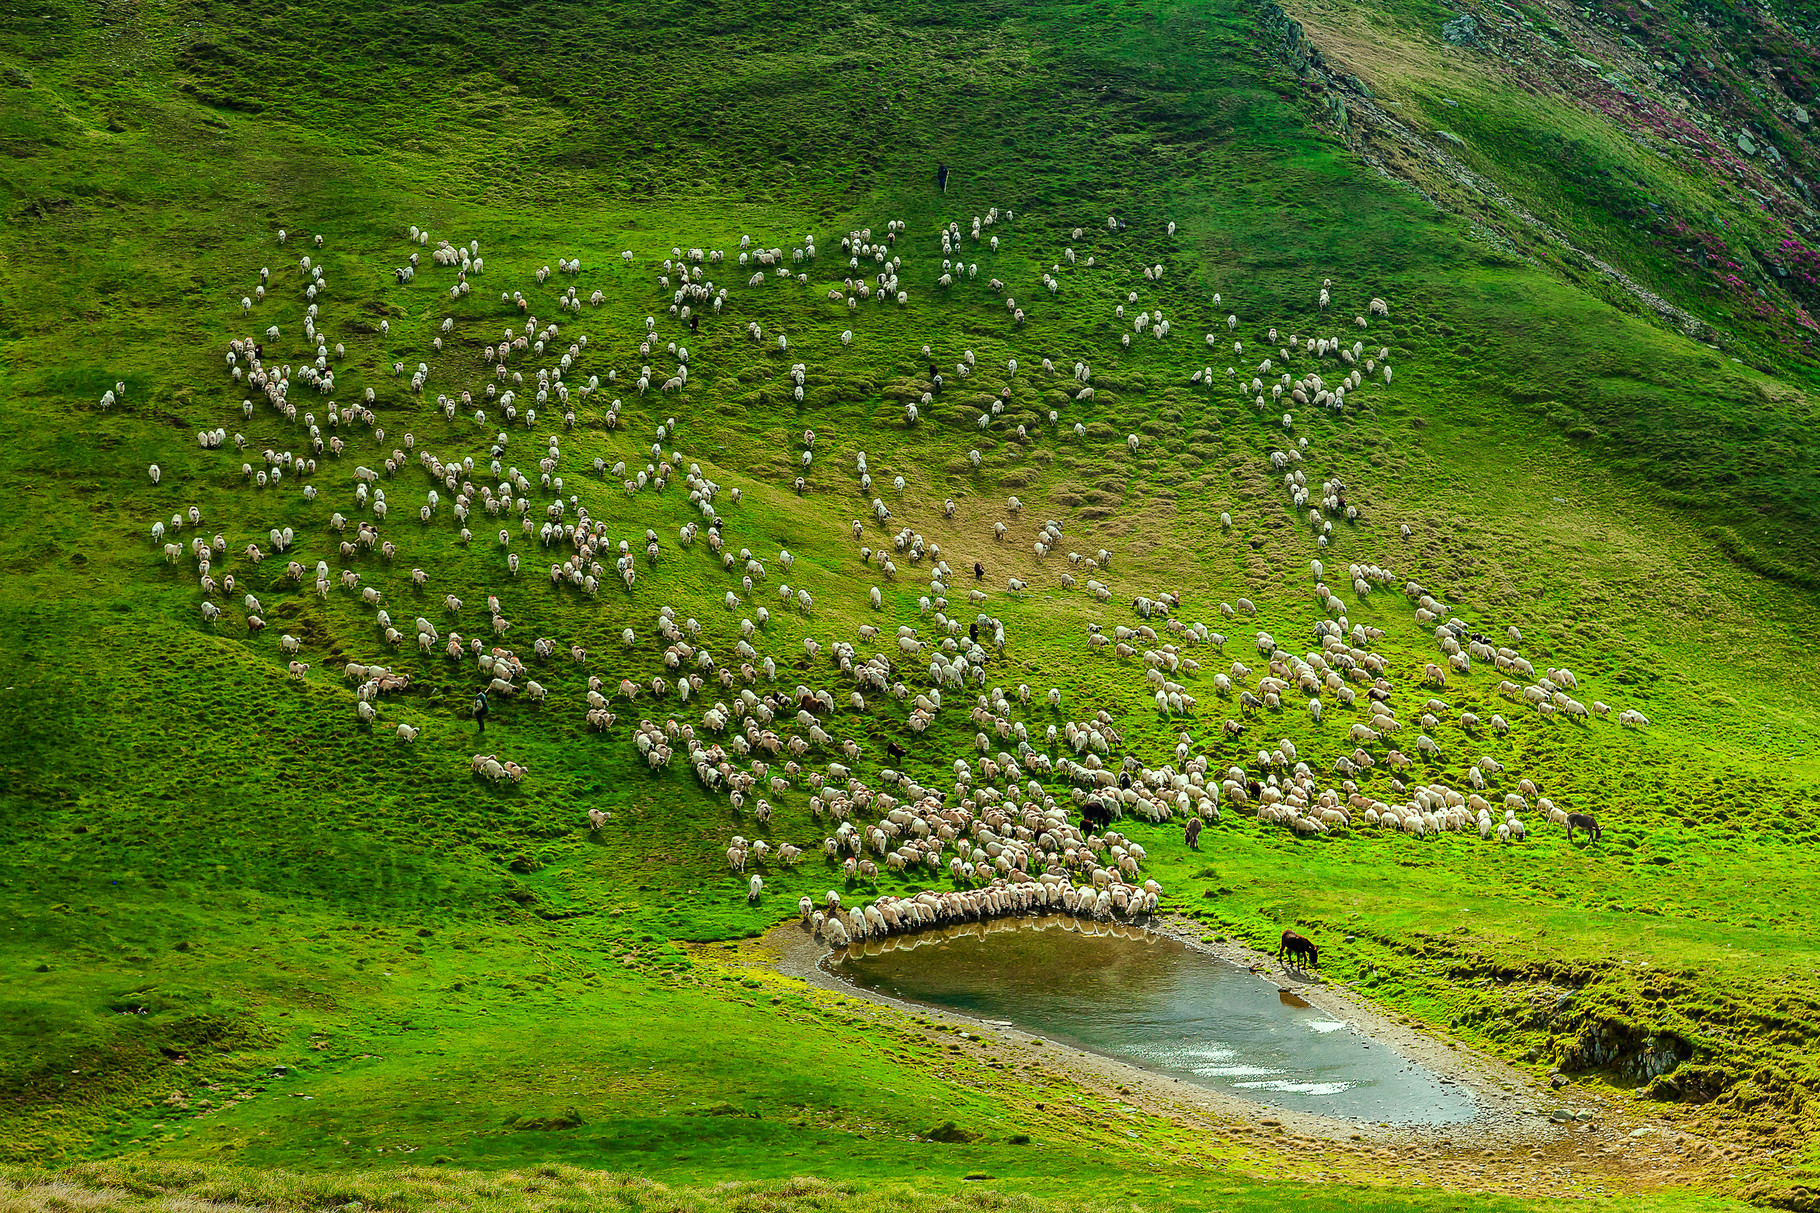 -B-Bronz CPSz medal - Fudulu Cătălin AFIAP (RO) - Sheep Parch/ Beparkírozott juhok